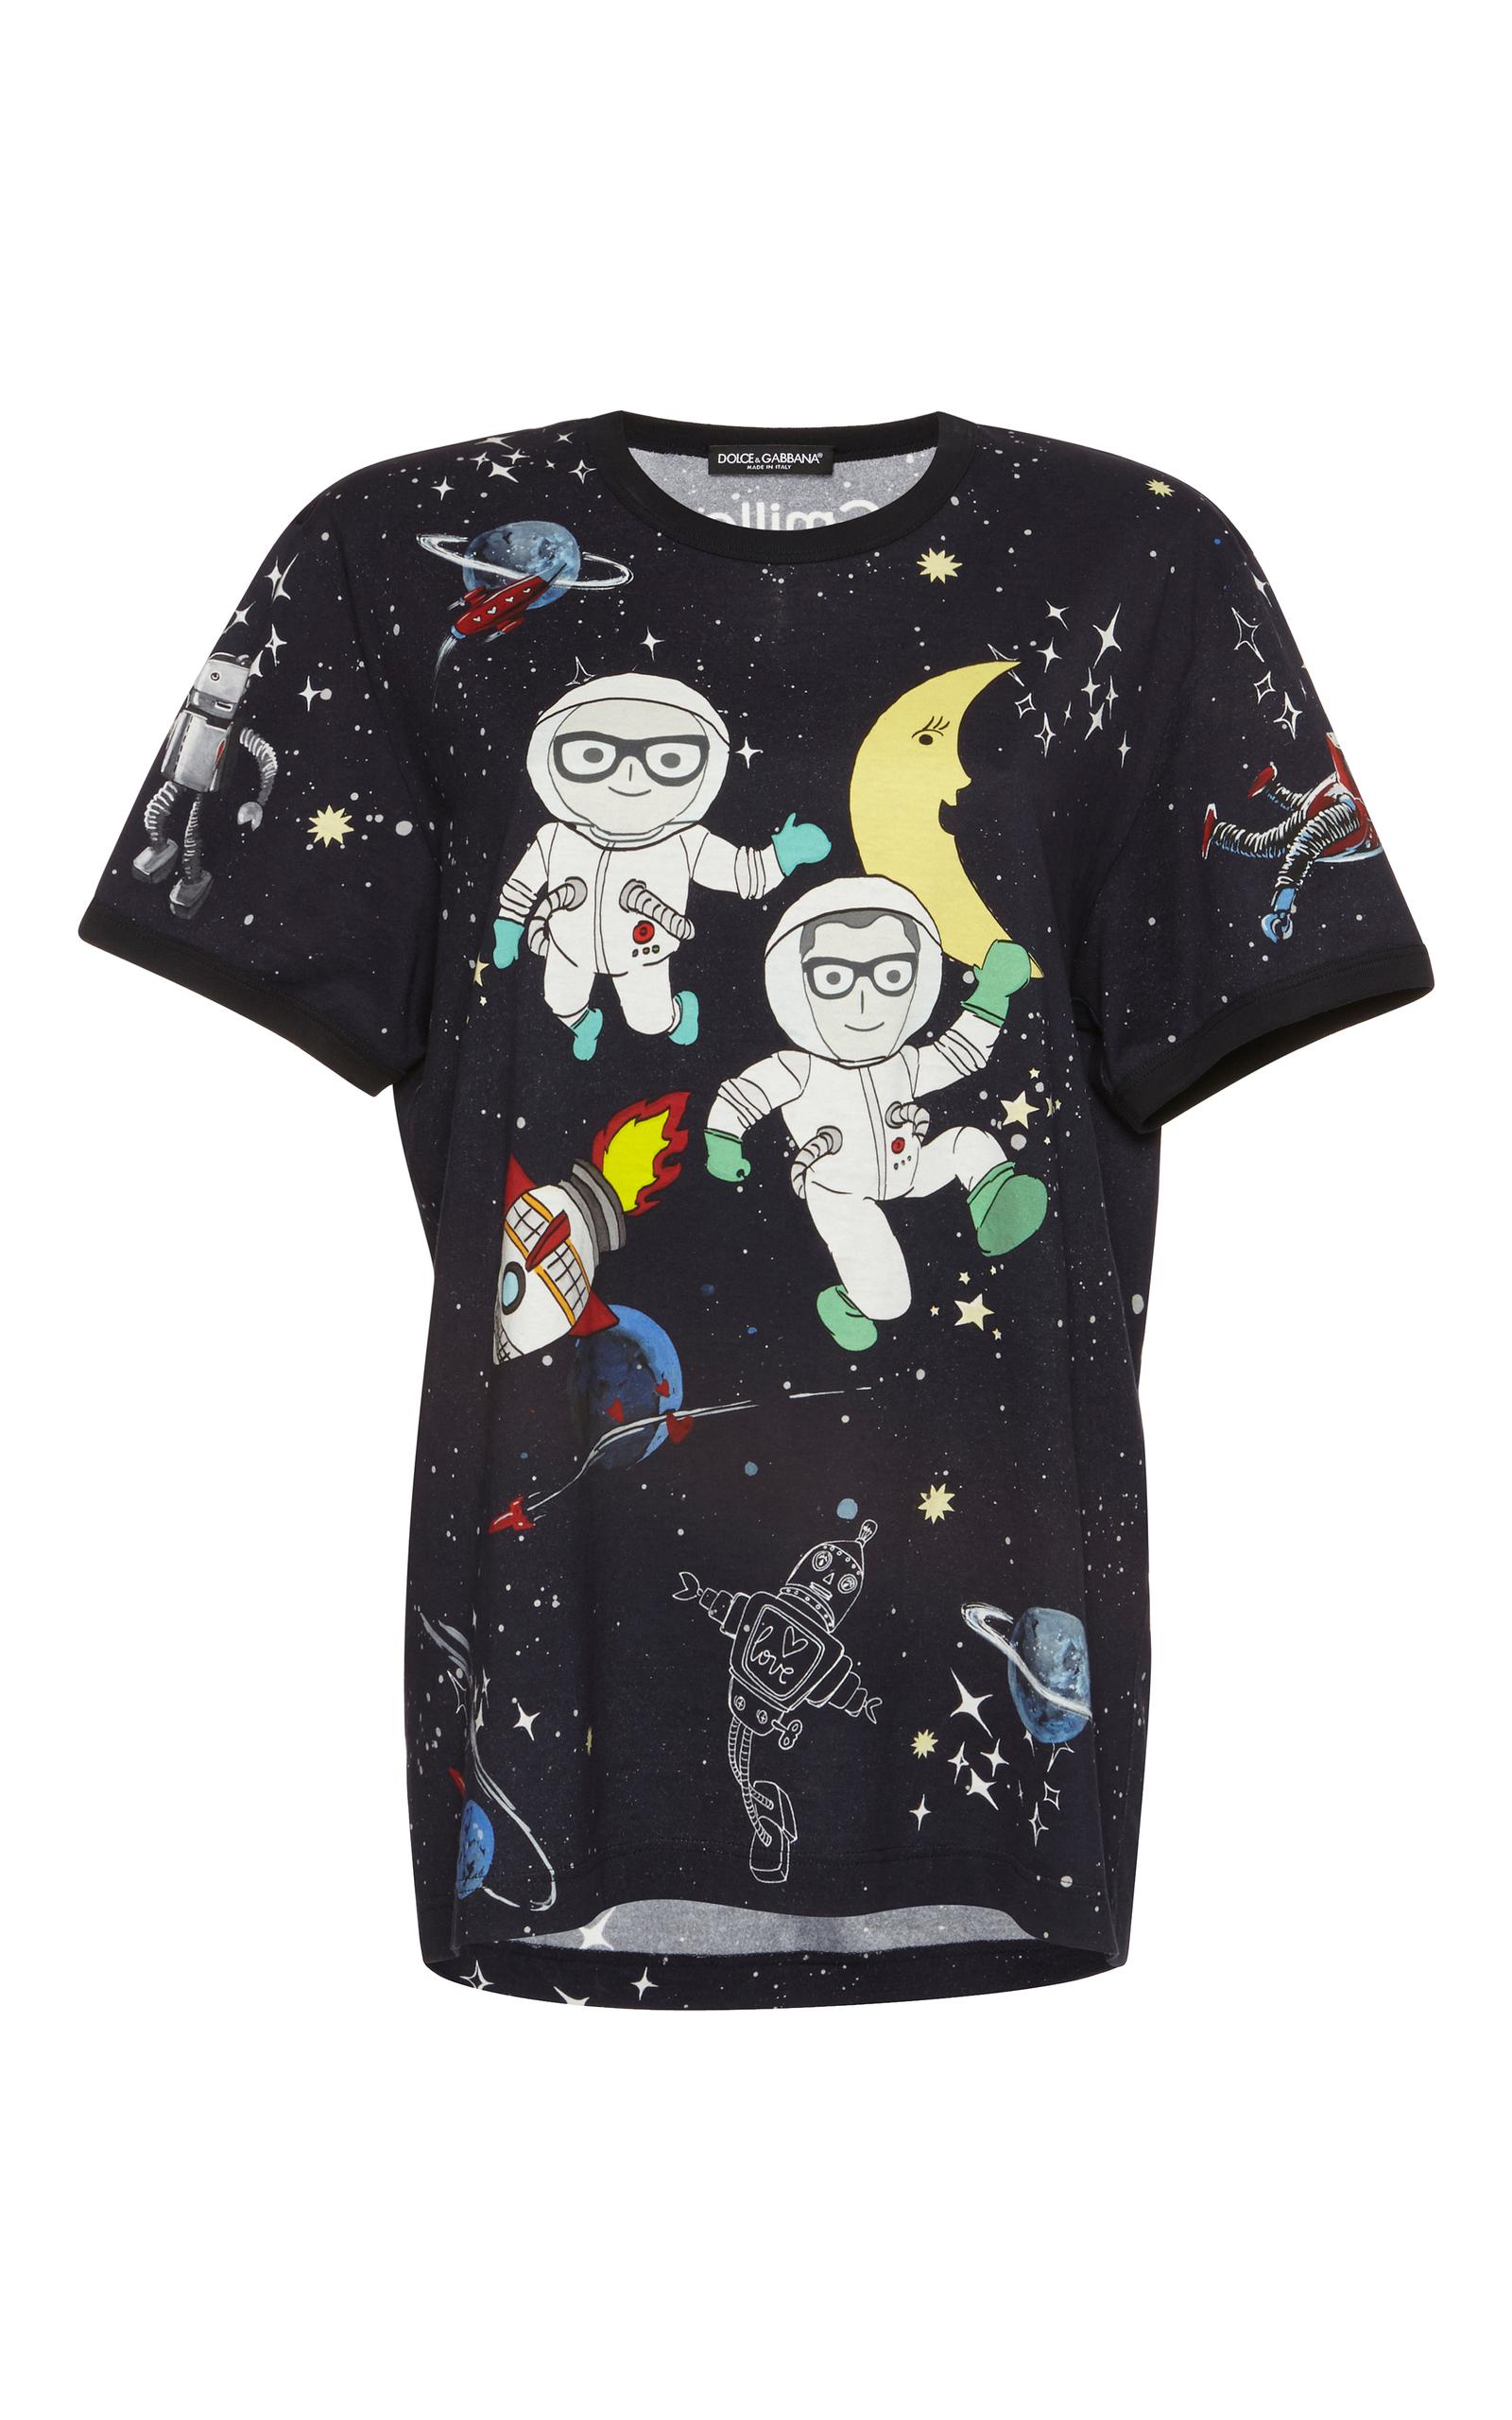 Short sleeve printed t shirt by dolce gabbana moda for Dolce and gabbana printed t shirts